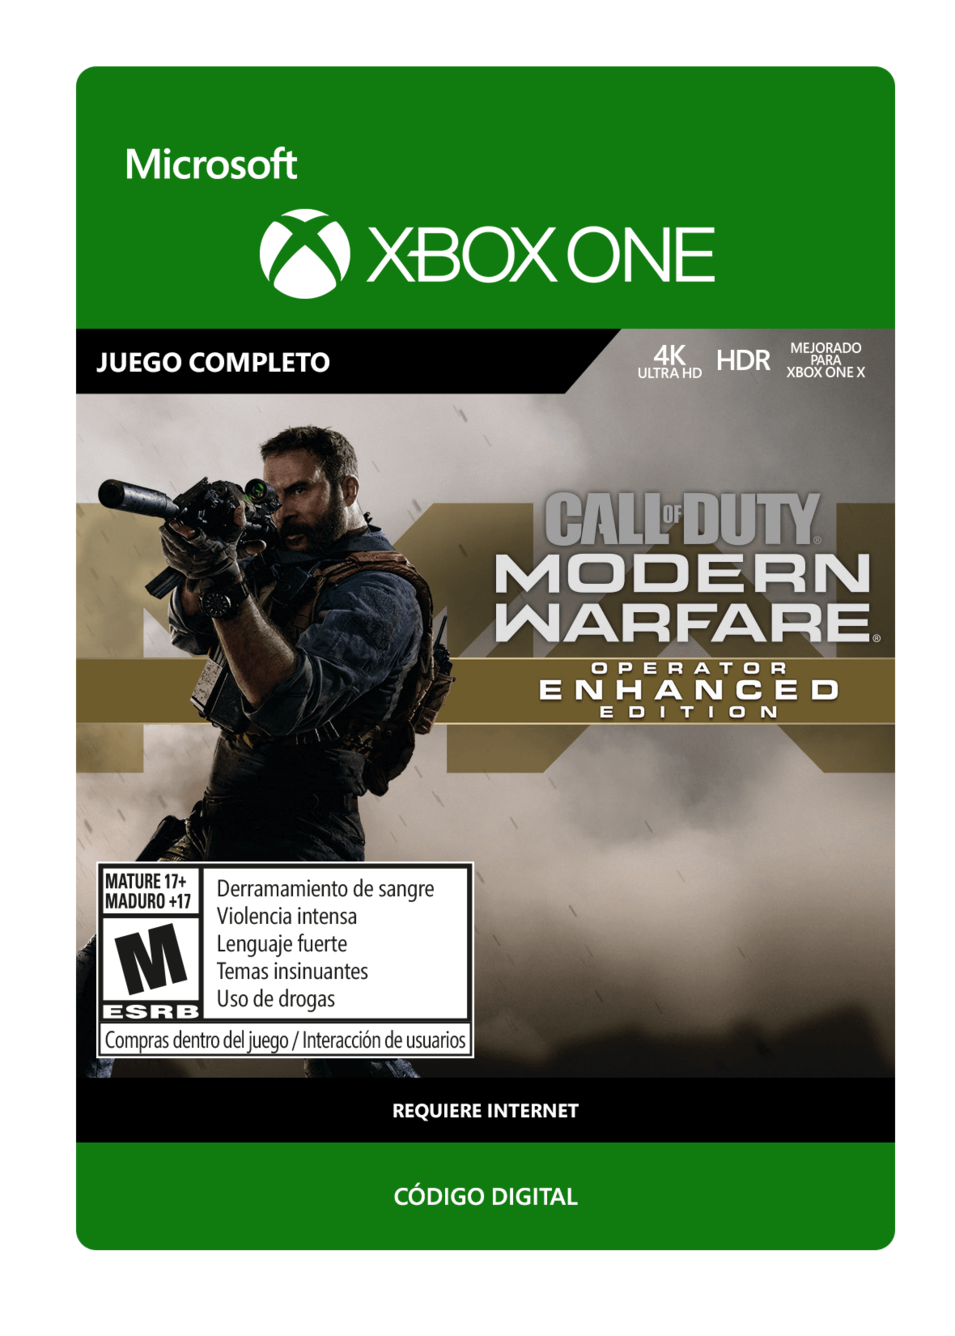 Call of Duty: Modern Warfare Operator Enhanced Edition